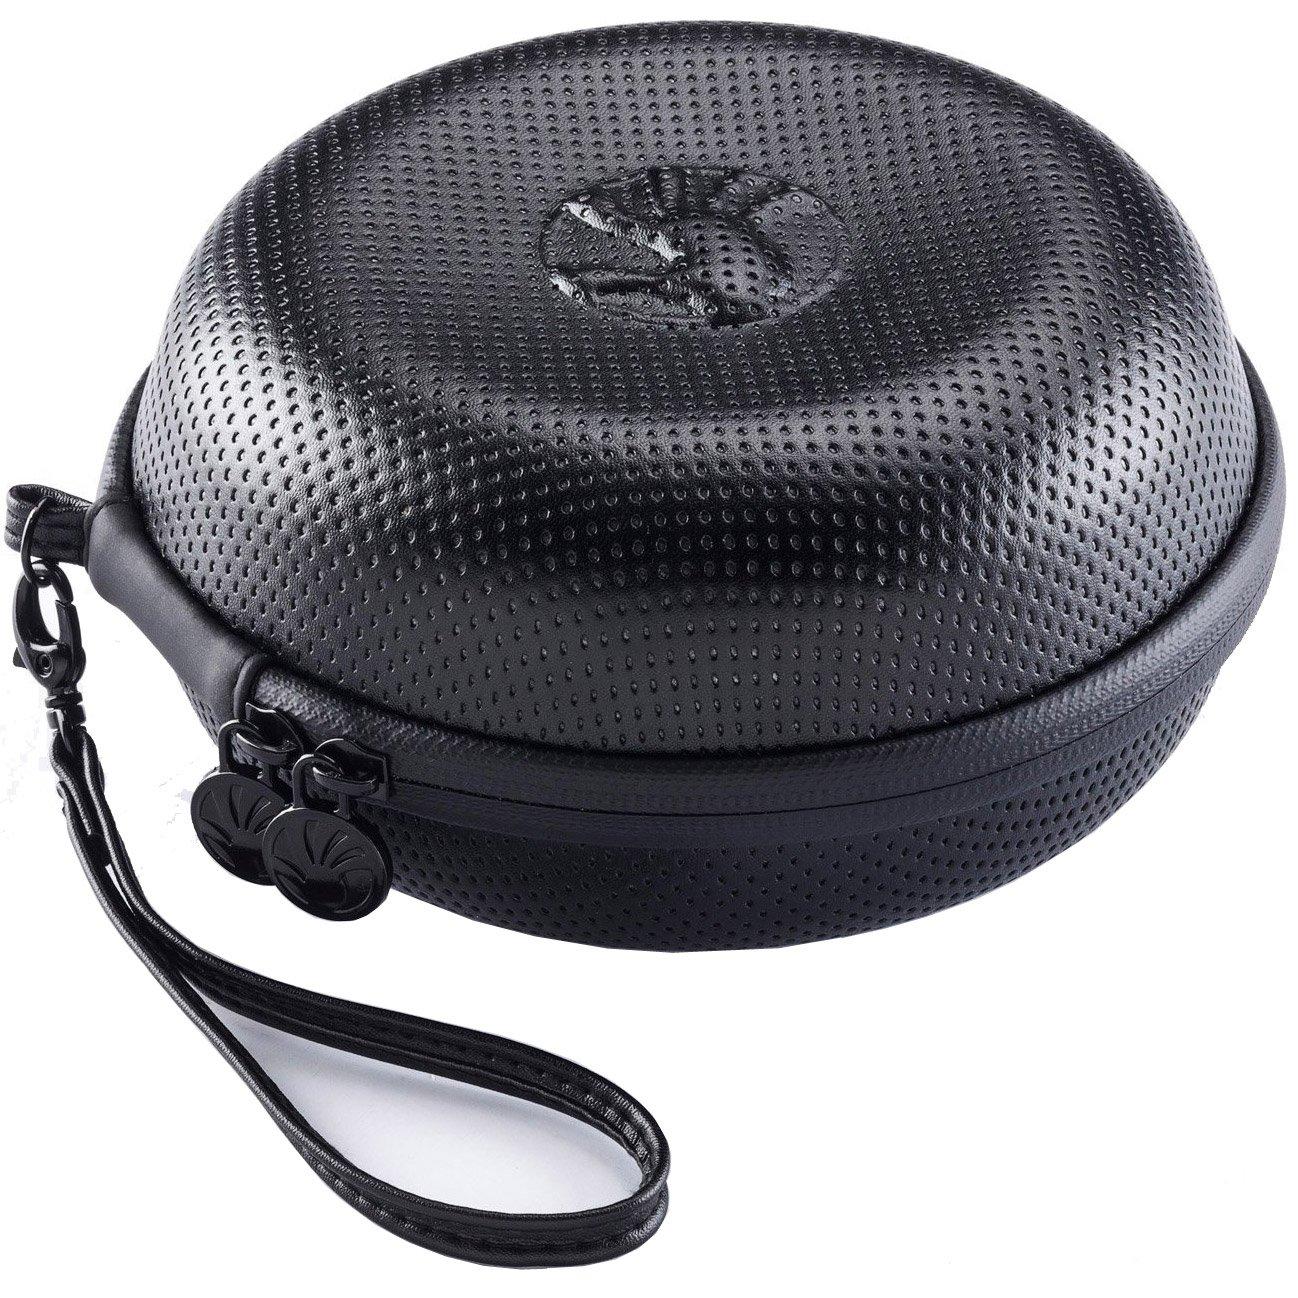 Slappa Large HardBody PRO Headphone case by Portable Digital